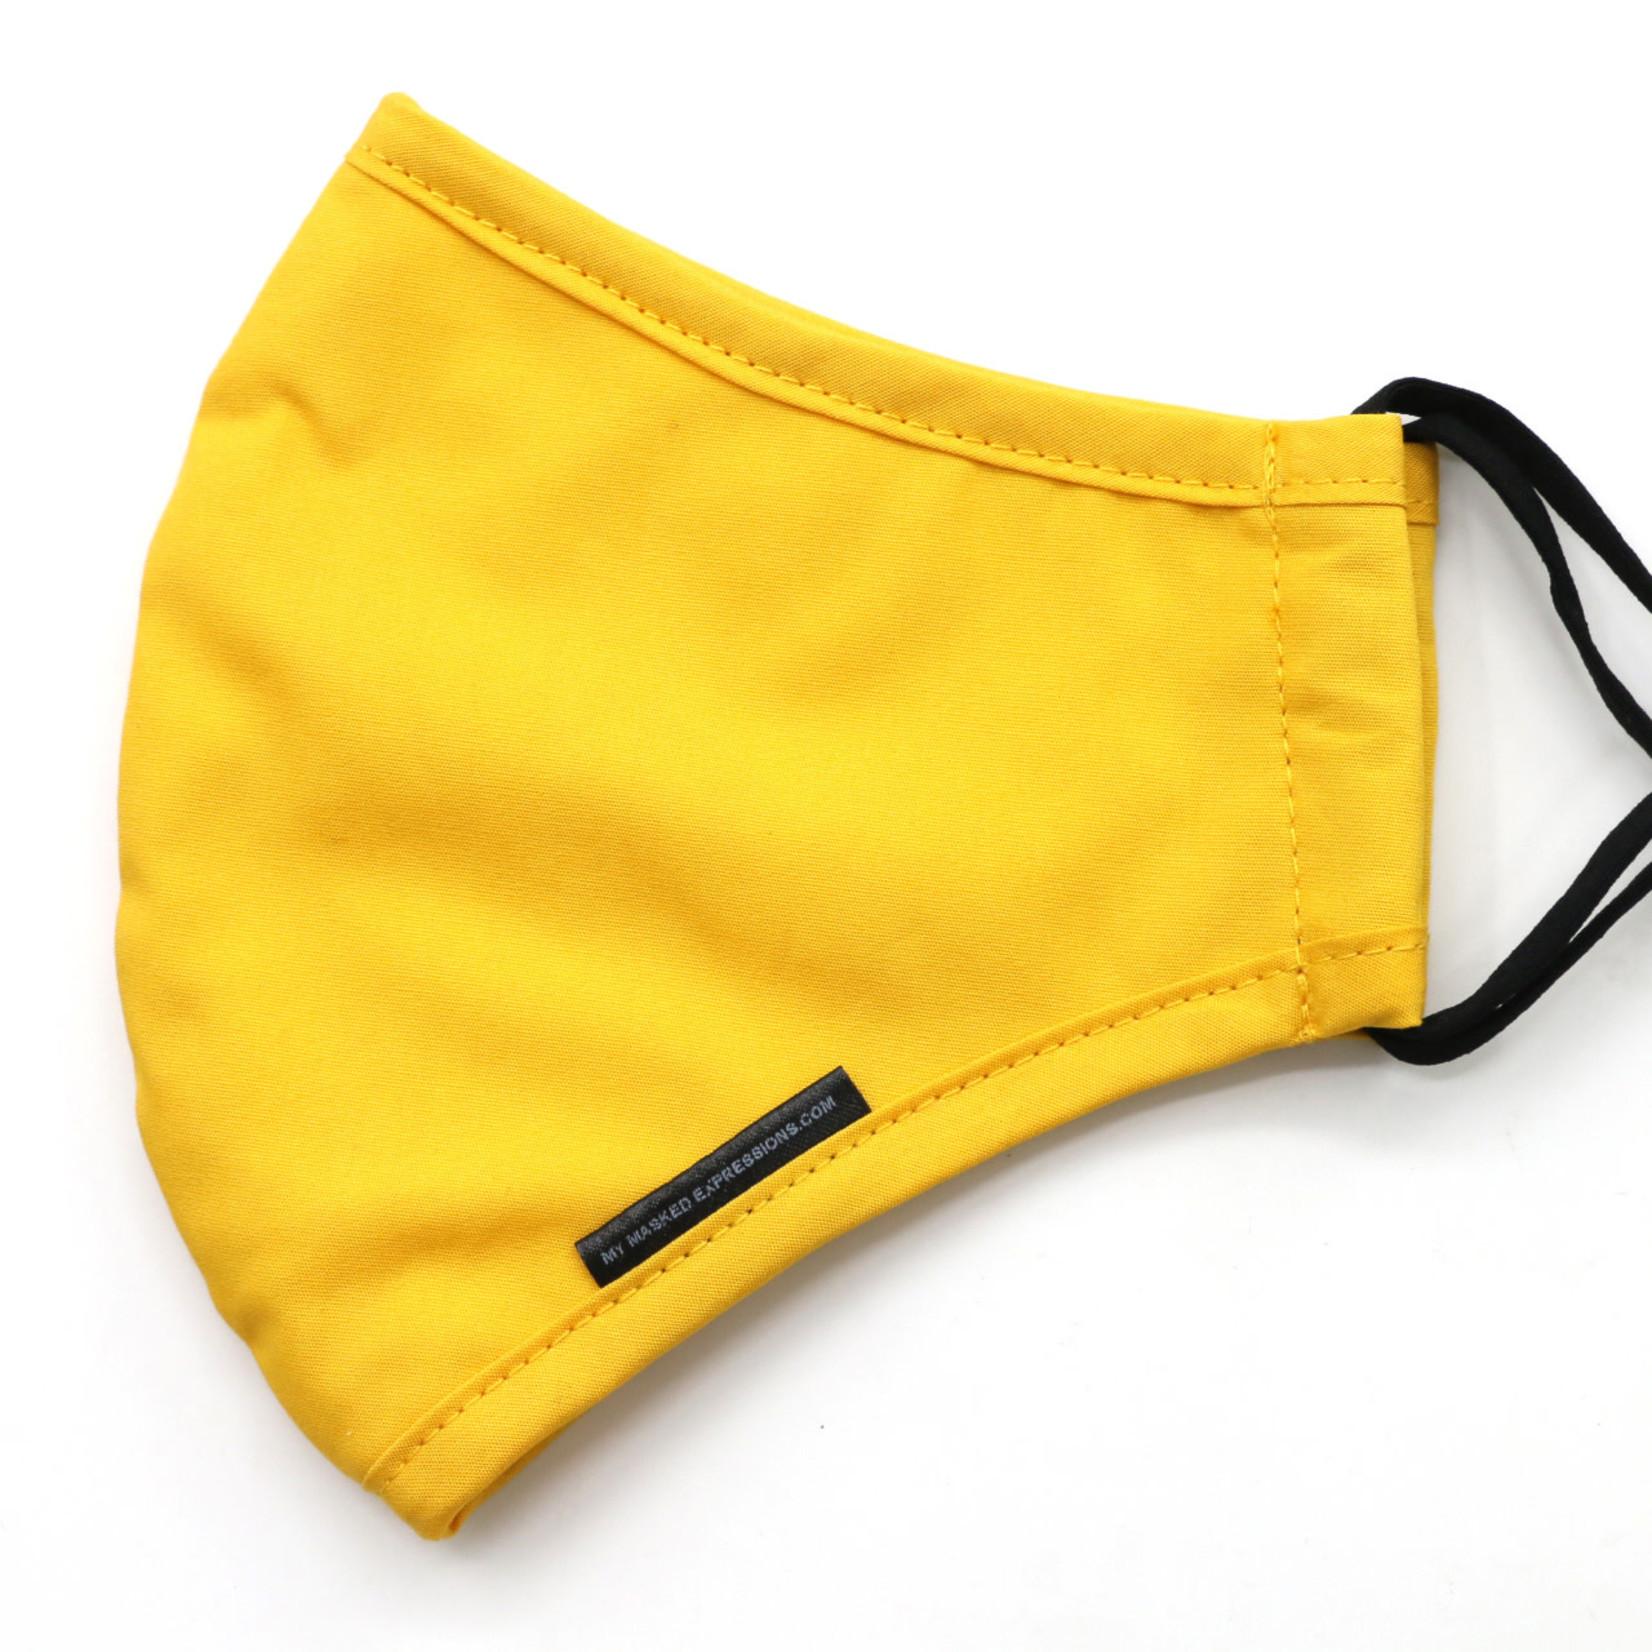 My Masked Expressions Adult Size Mask, Mustard Yellow Cotton